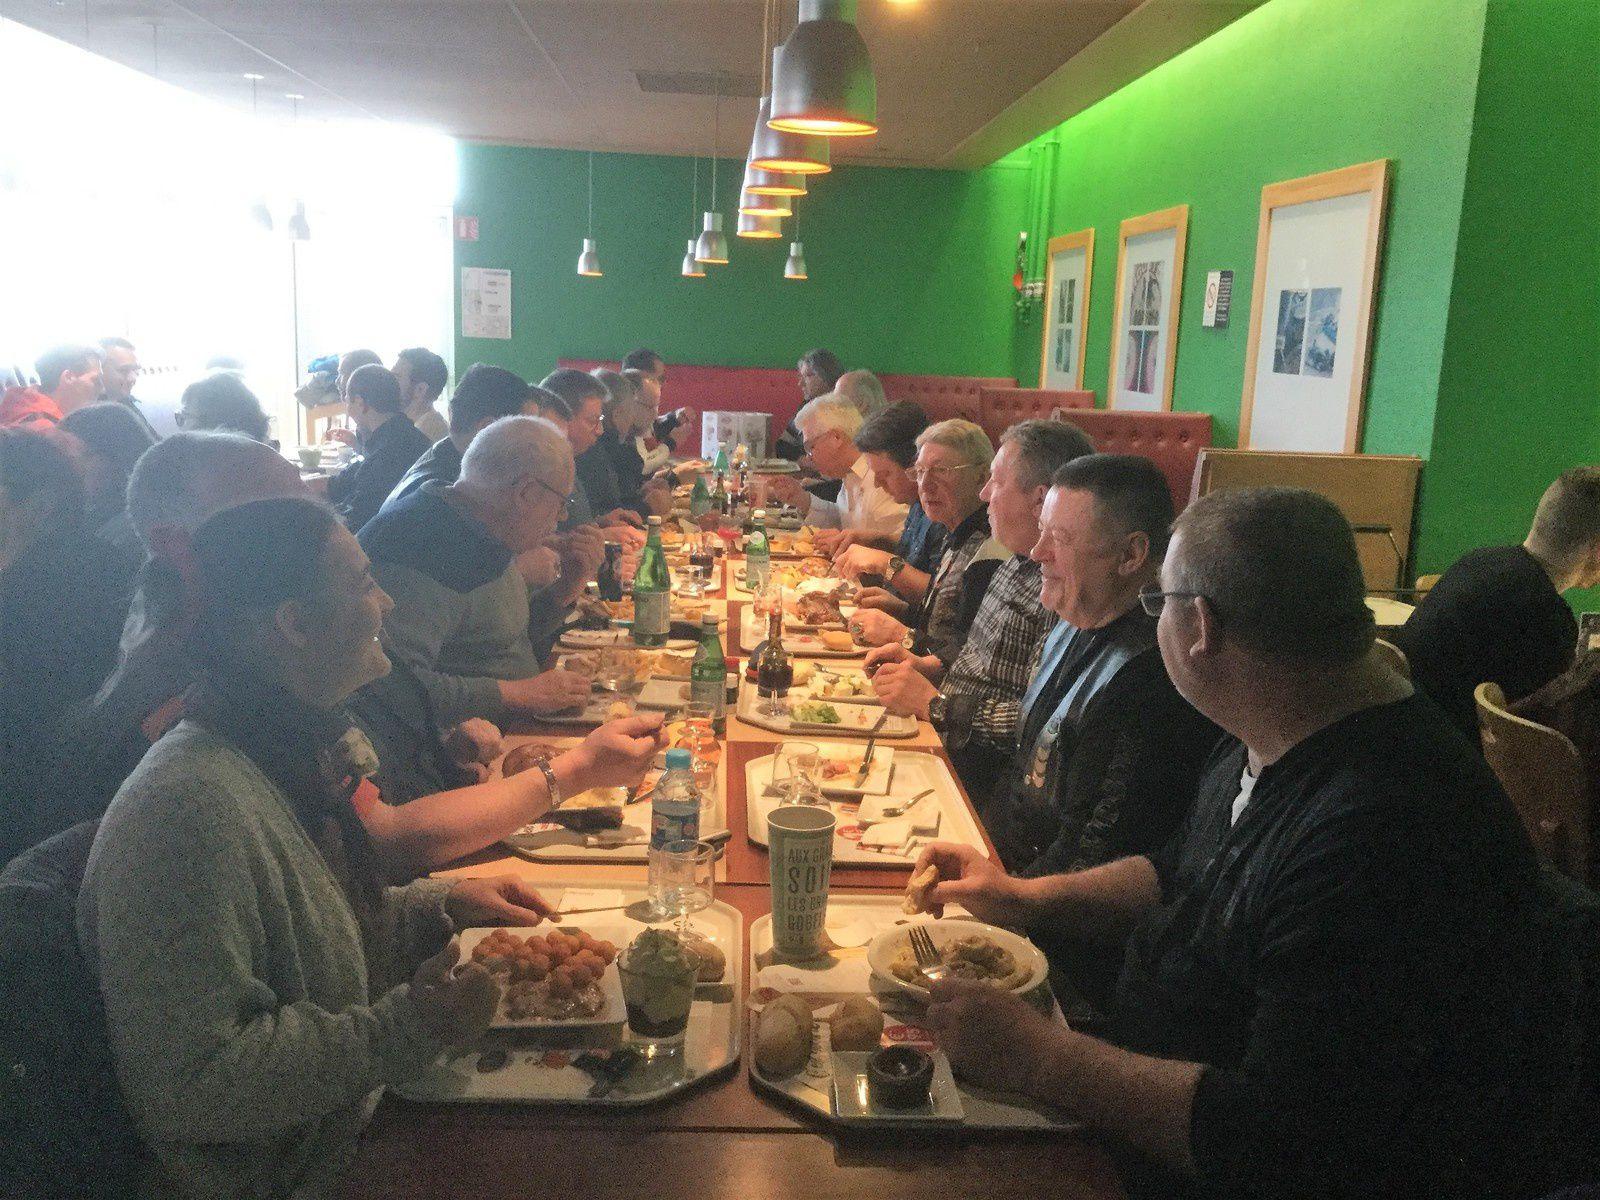 Goldwing Unsersbande - Rencontre hivernale Unsersbande 2018